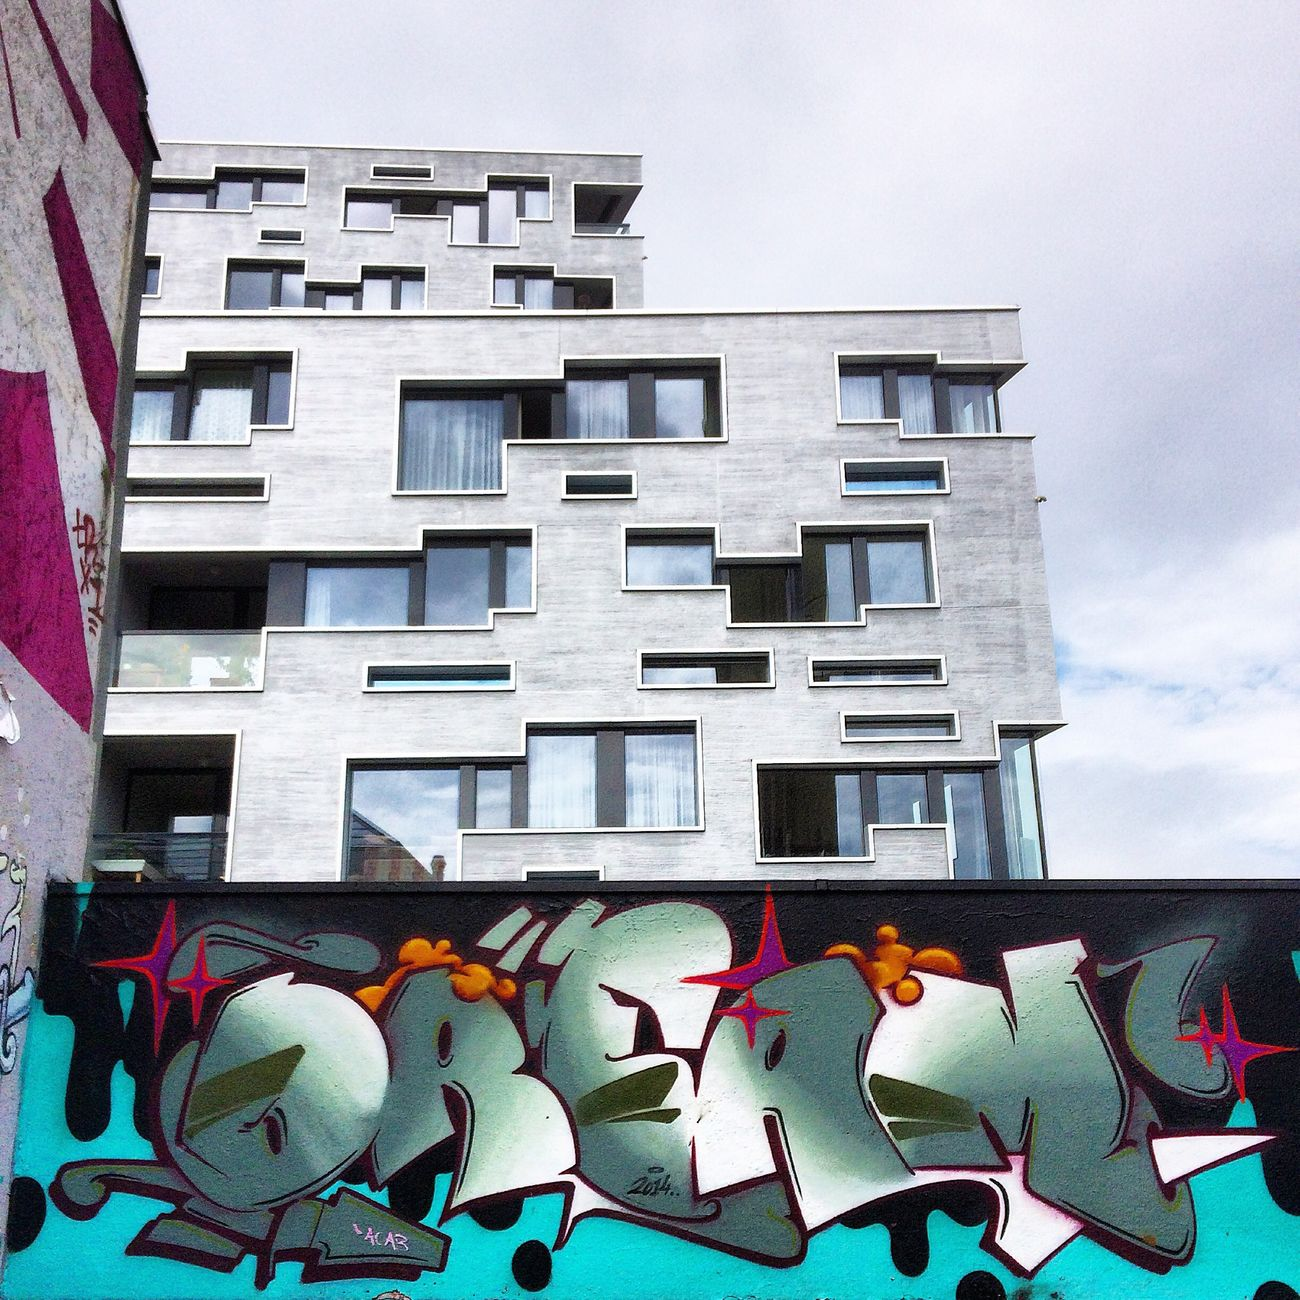 Dream Street Art/Graffiti UrbanART Urban Geometry